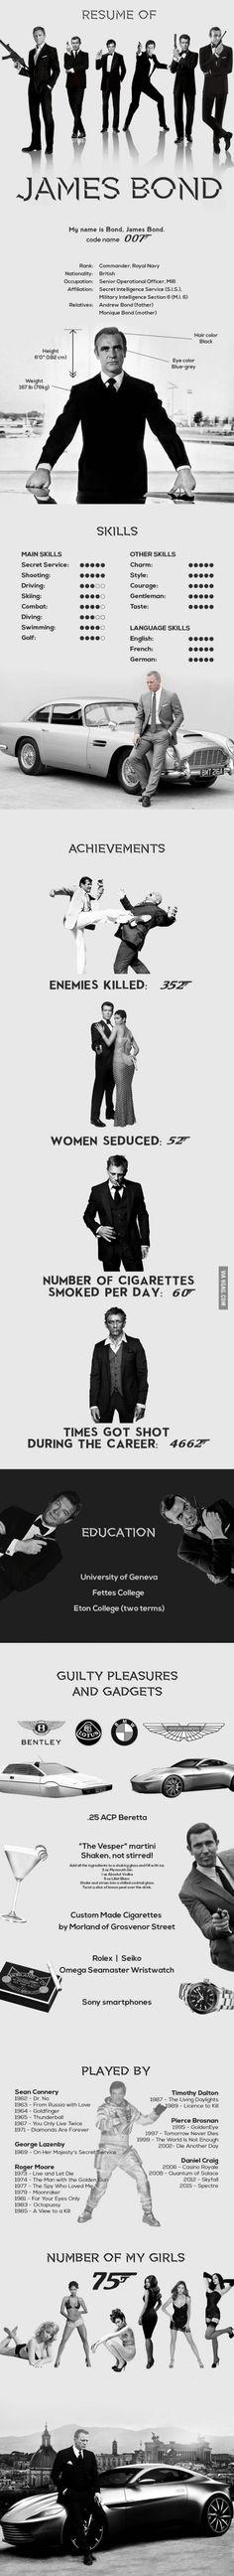 Ultimate resume of James Bond                              …                                                                                                                                                                                 More